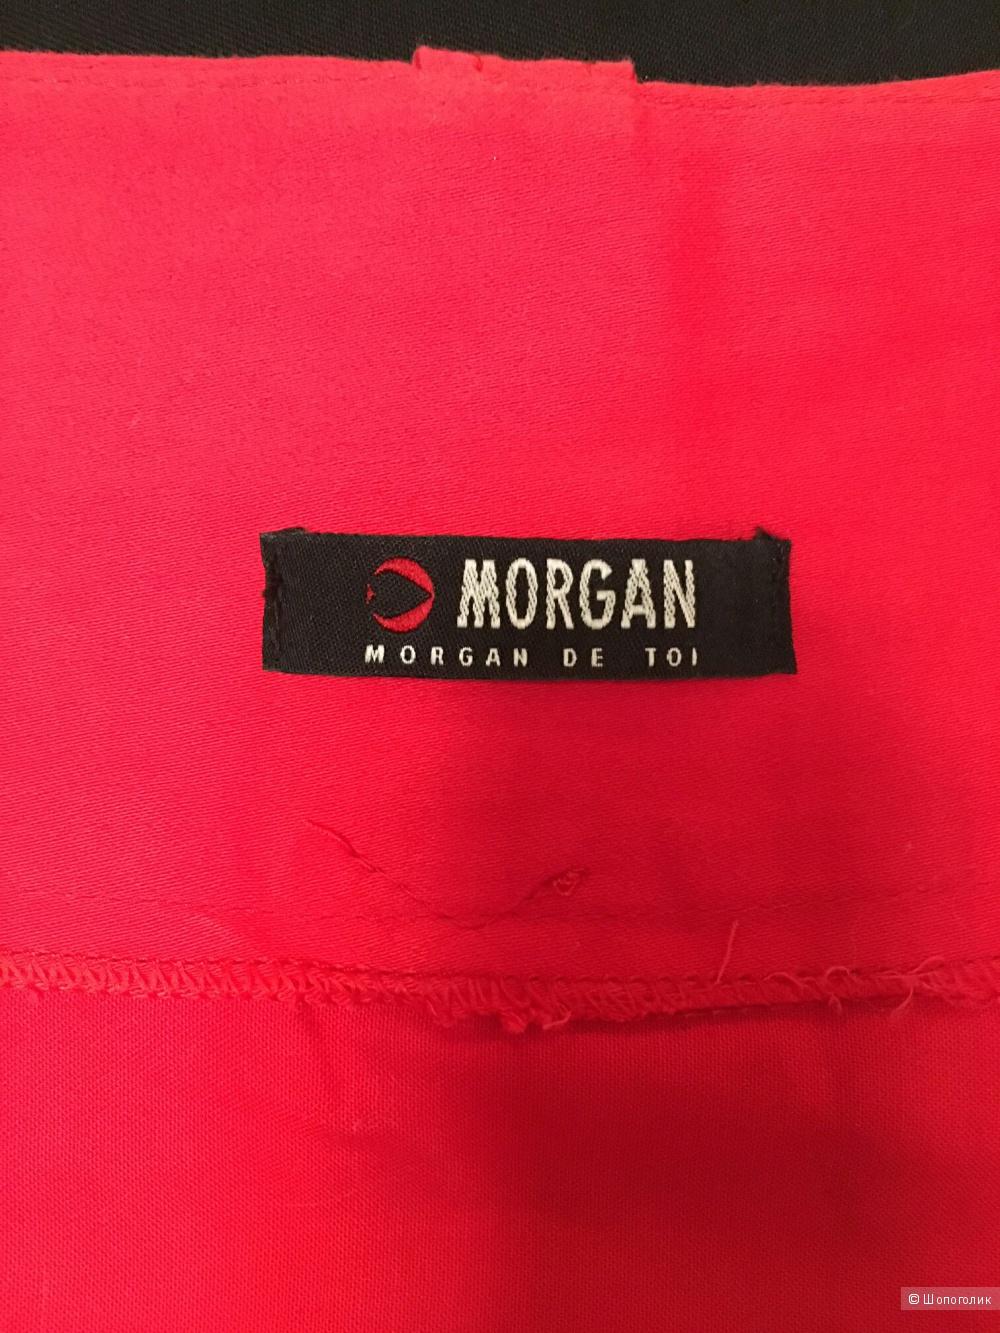 Юбка  Morgan. Размер 40.